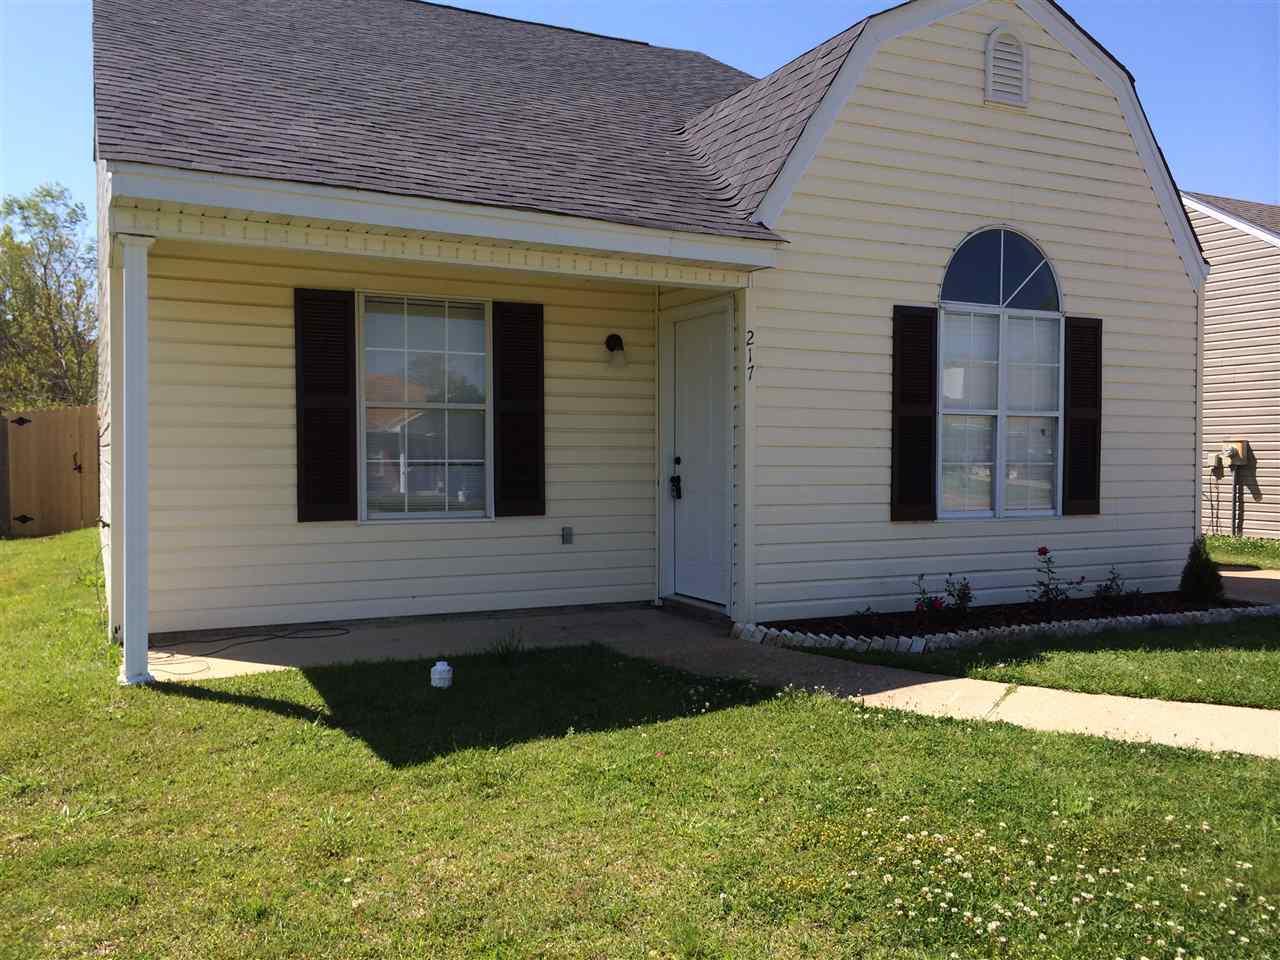 Rental Homes for Rent, ListingId:33018200, location: 217 VILLAGE CV Pearl 39208